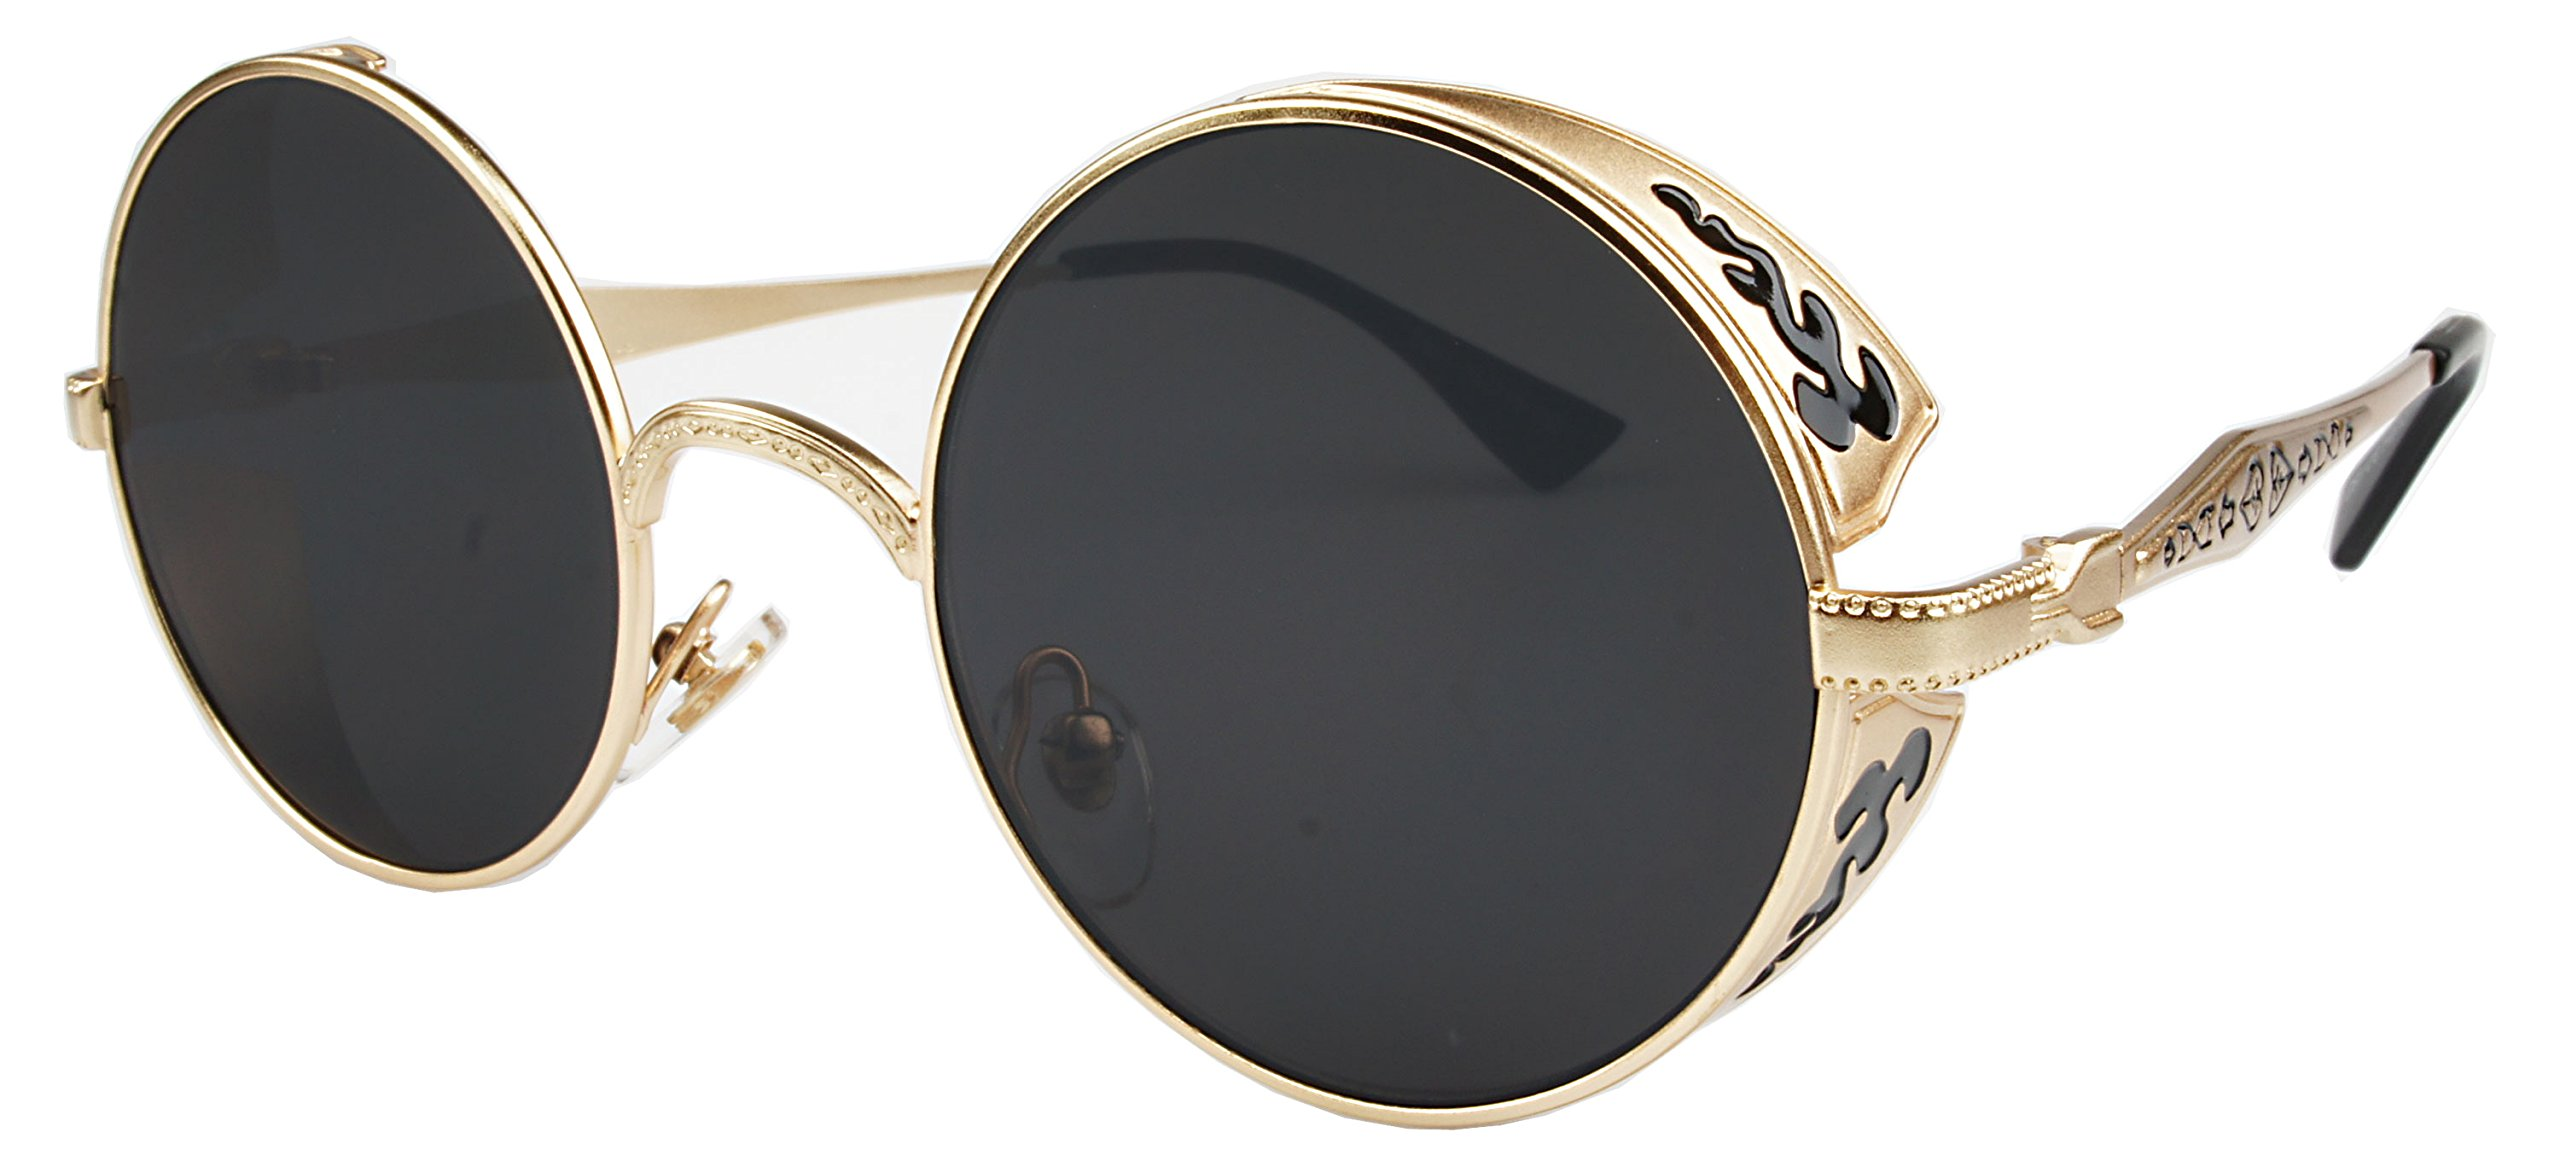 Vintage Hippie Retro Metal Round Circle Sunglasses Gold Frame Black ...